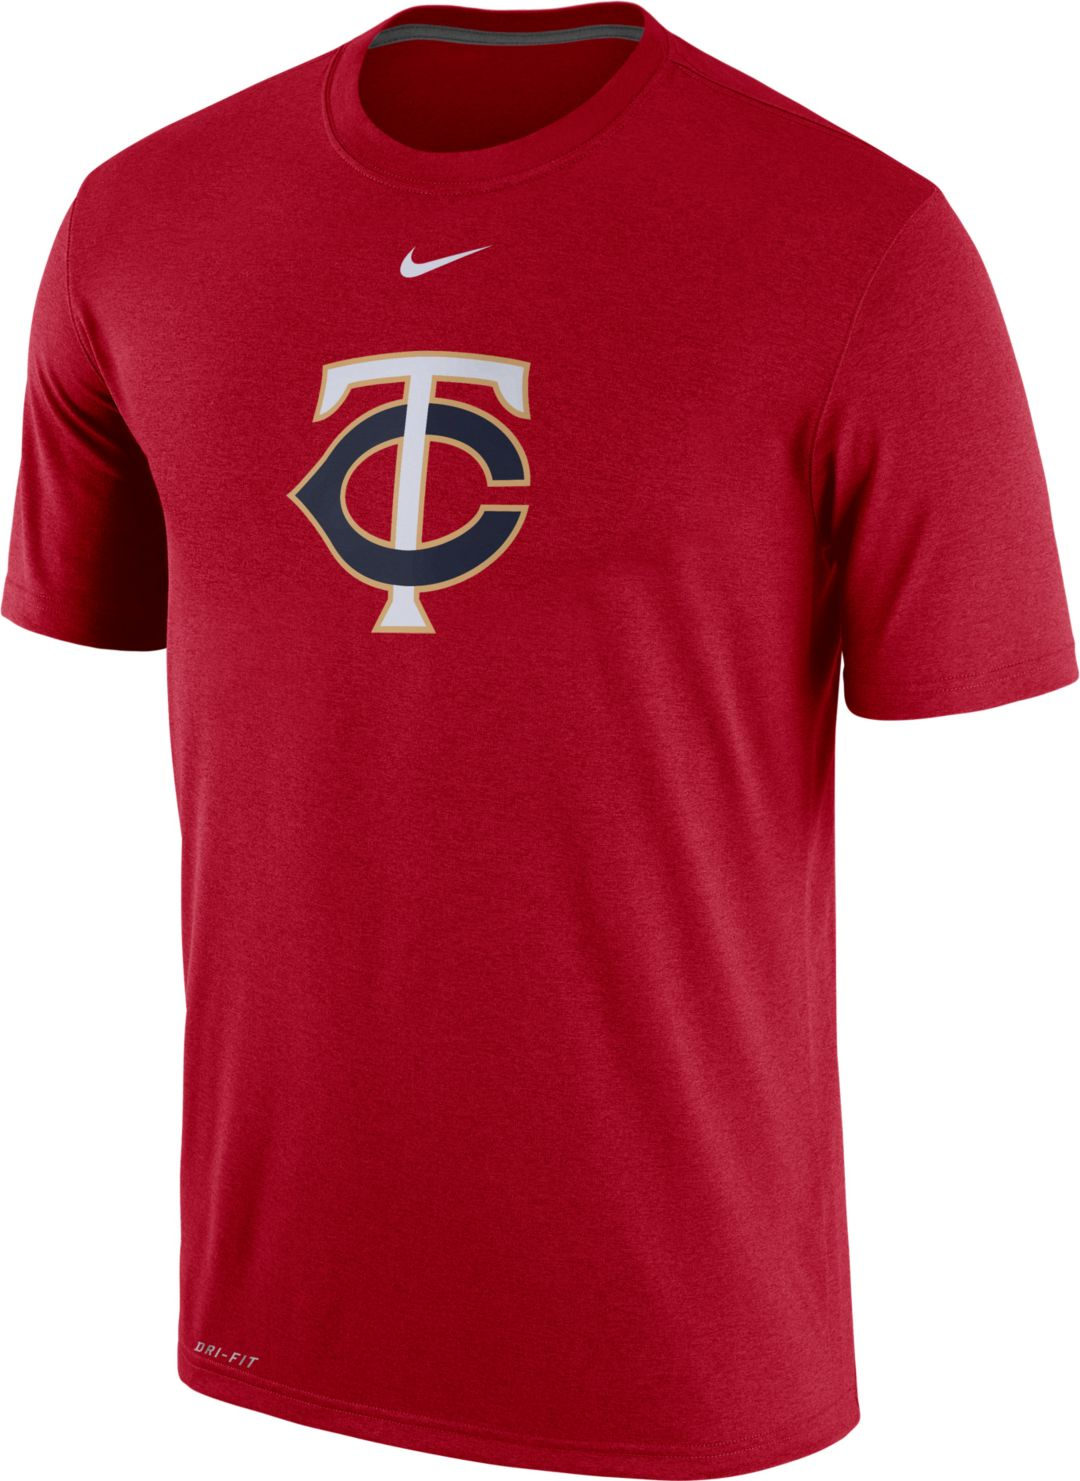 super popular 1cfc9 8a4f2 Nike Men s Minnesota Twins Dri-FIT Legend T-Shirt. noImageFound. Previous. 1.  2